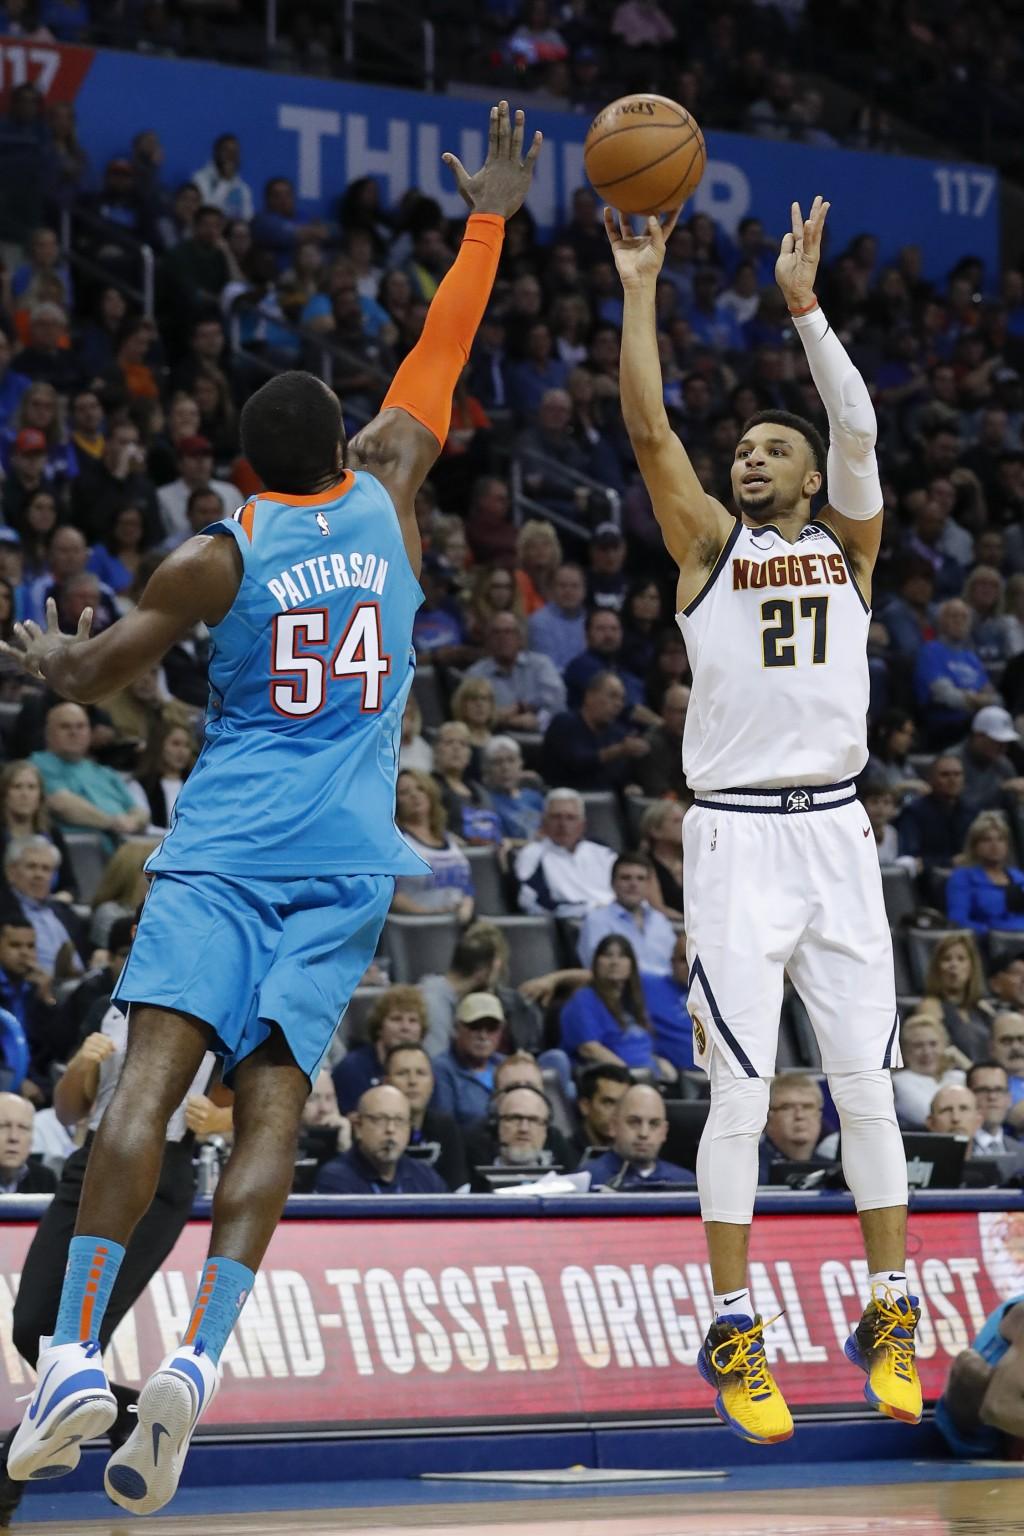 Denver Nuggets guard Jamal Murray (27) shoot as Oklahoma City Thunder forward Patrick Patterson (54) defends during the first half of an NBA basketbal...